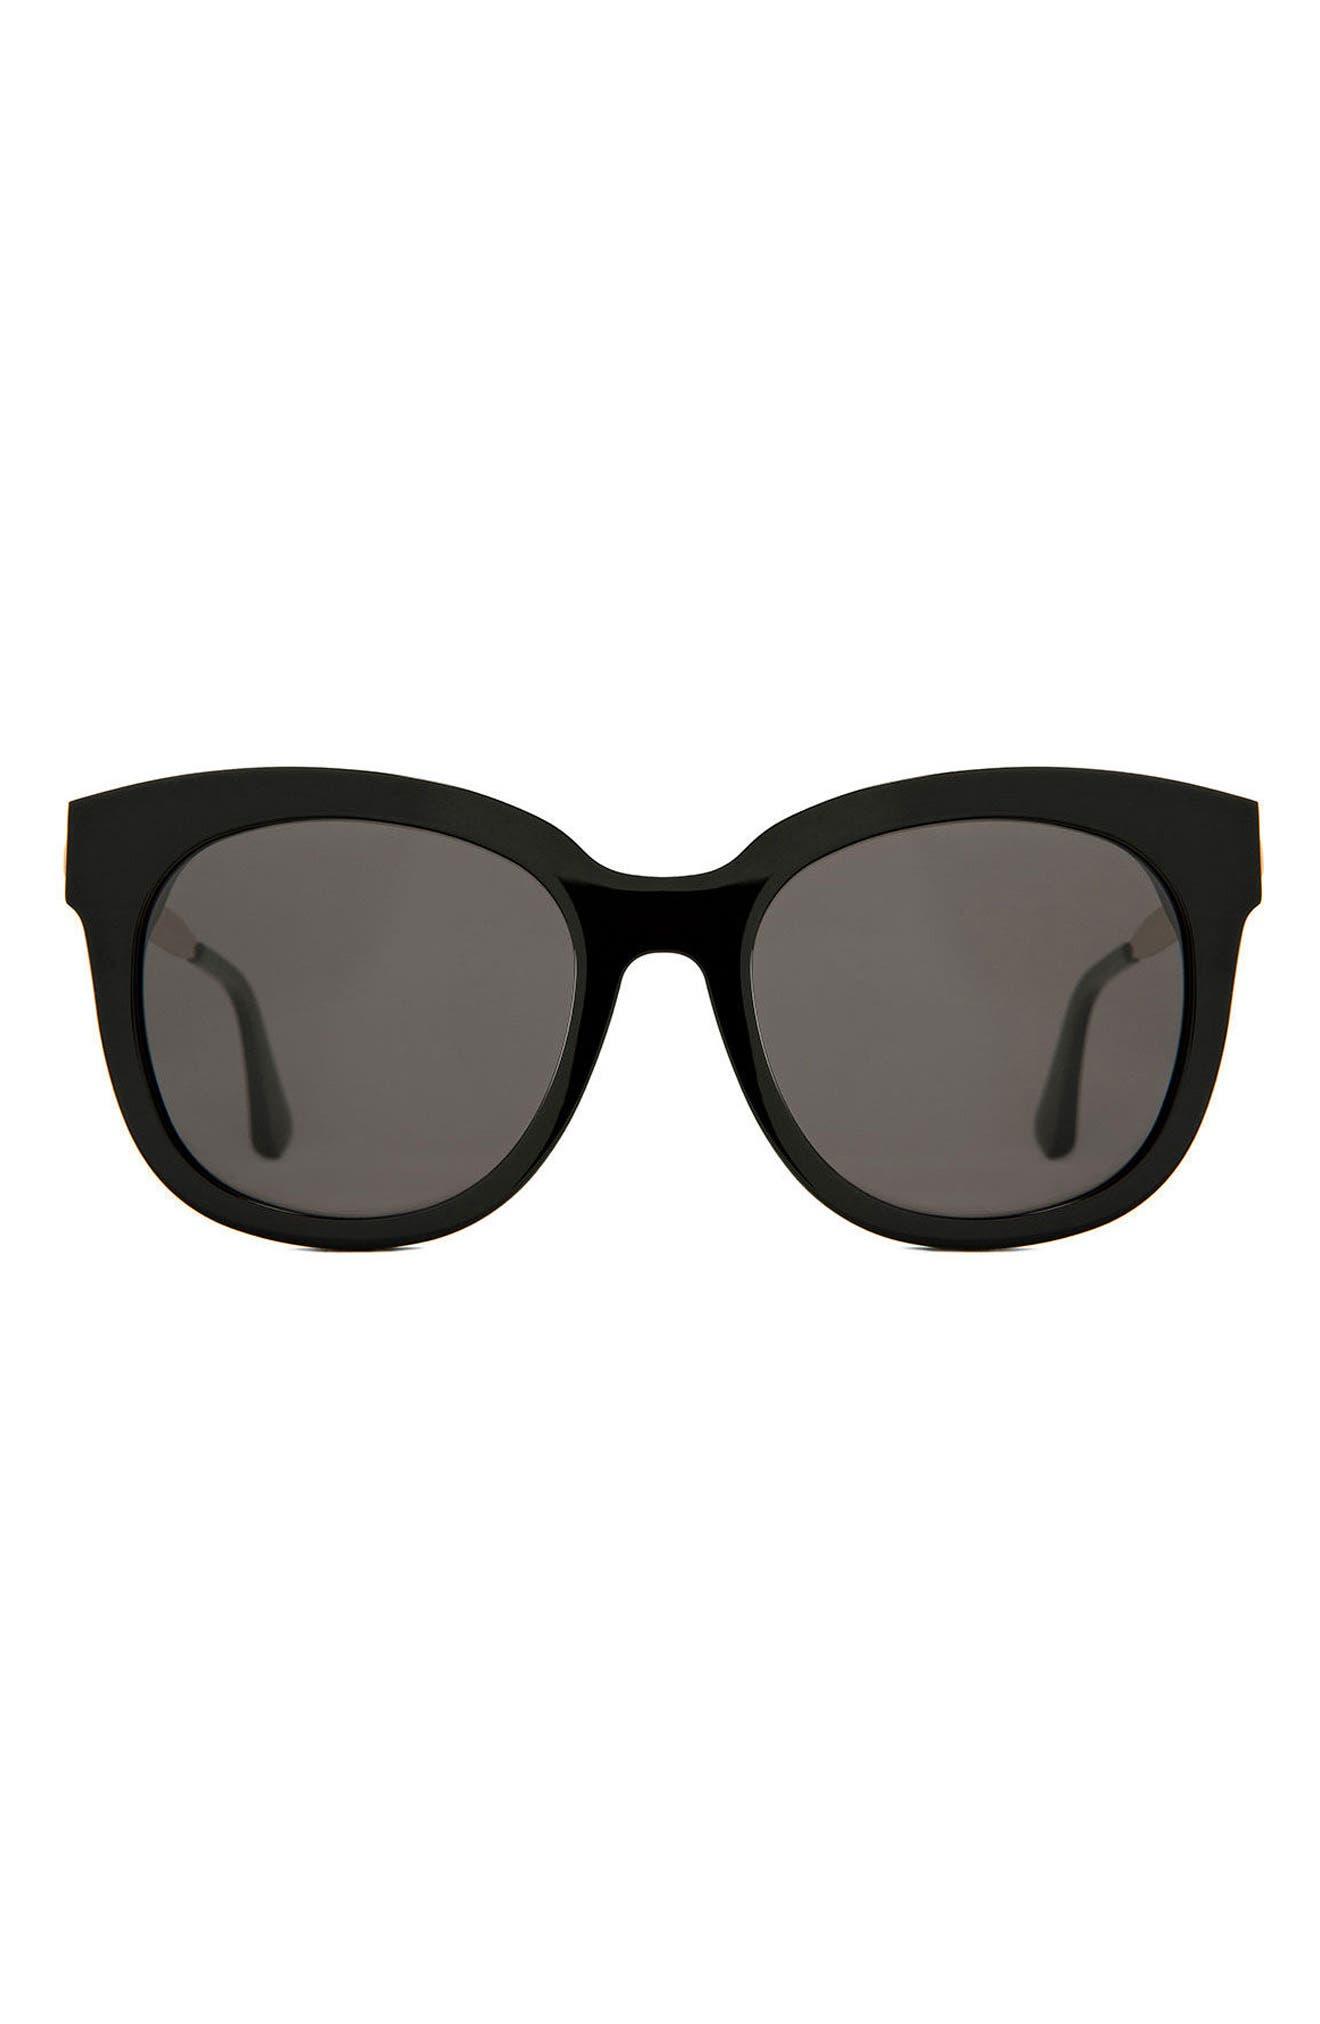 Cuba 55mm Sunglasses,                             Main thumbnail 1, color,                             001